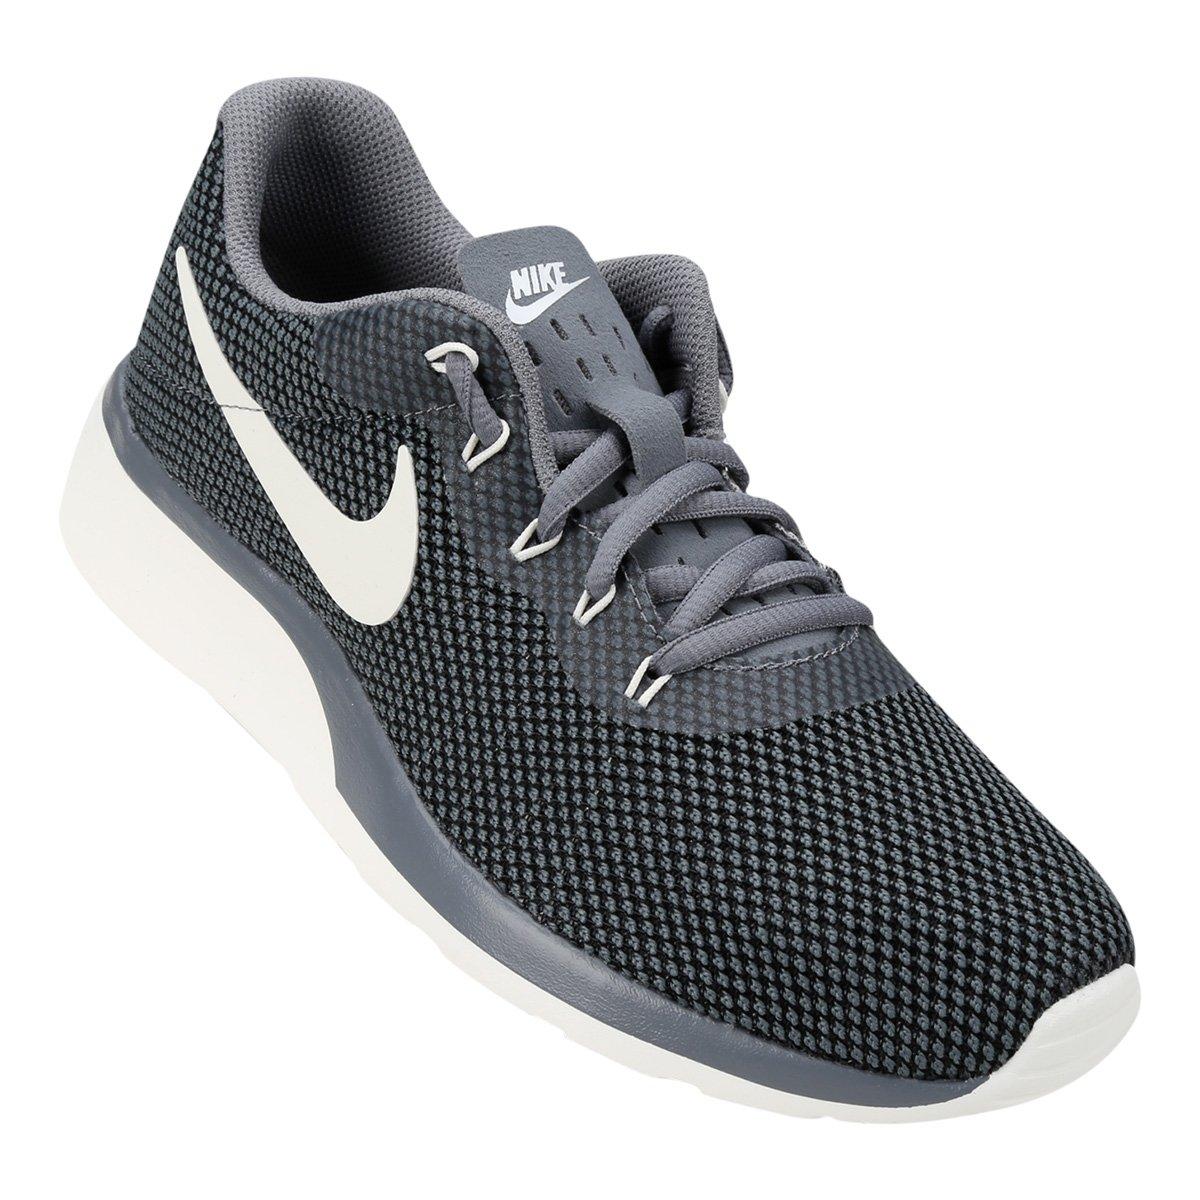 Tênis Nike Tanjun Racer Feminino - Compre Agora  4a501fb802054